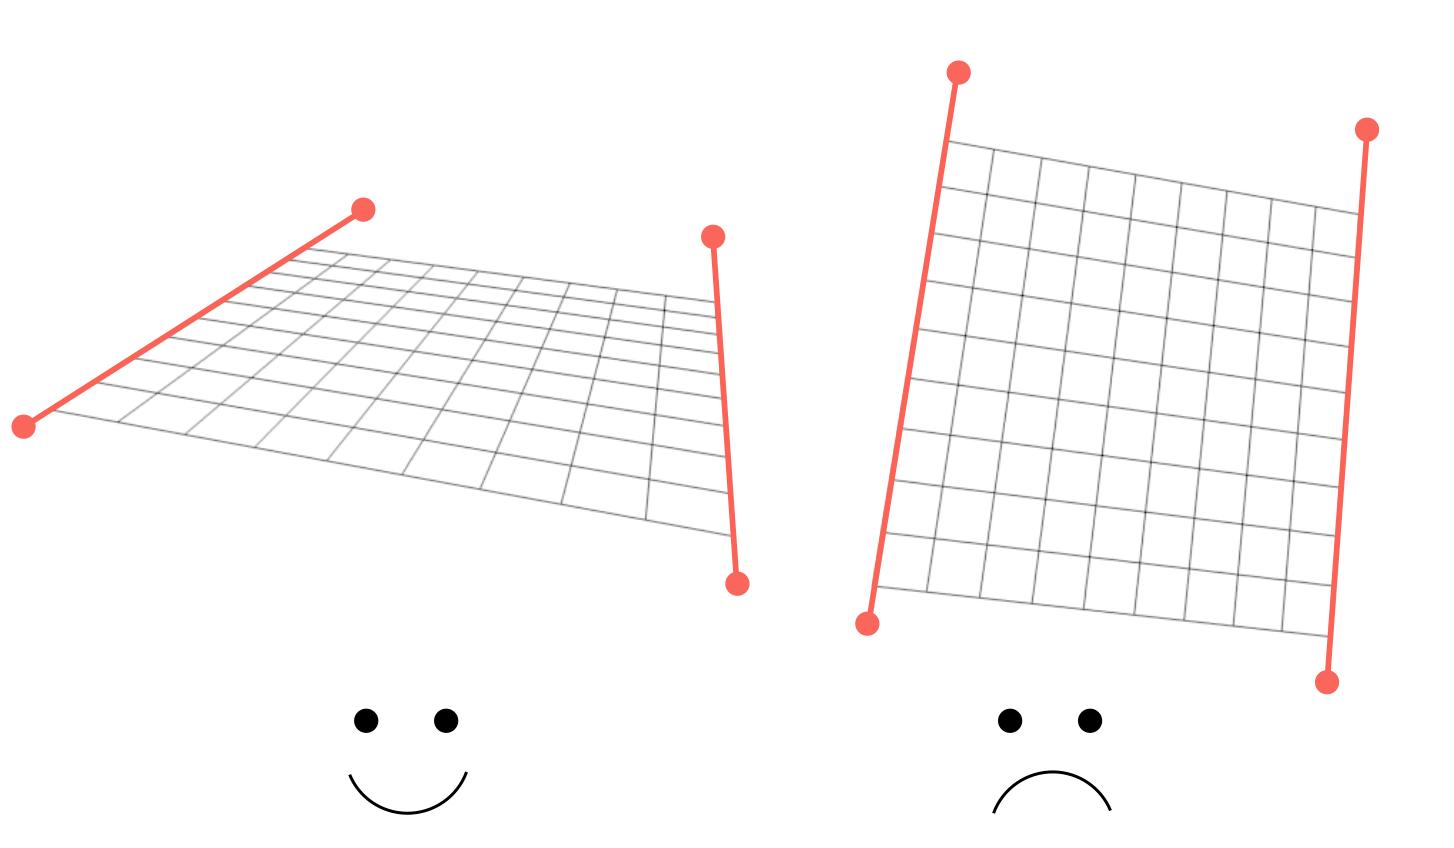 Vanishing point positions